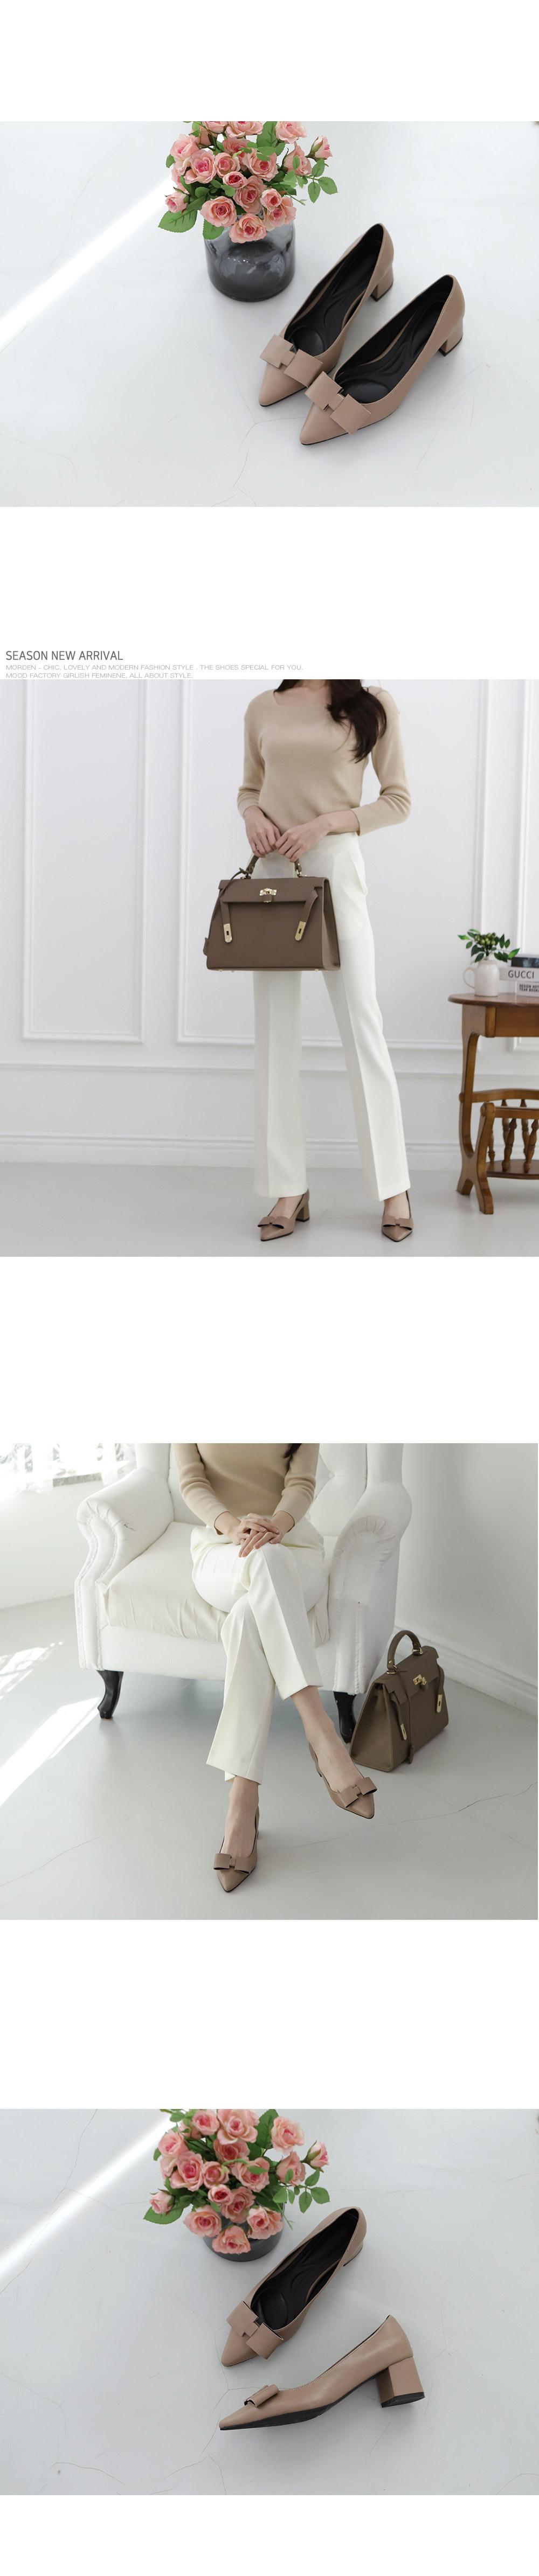 [Handmade] Kelly Leather Middle Heels-holiholic.com